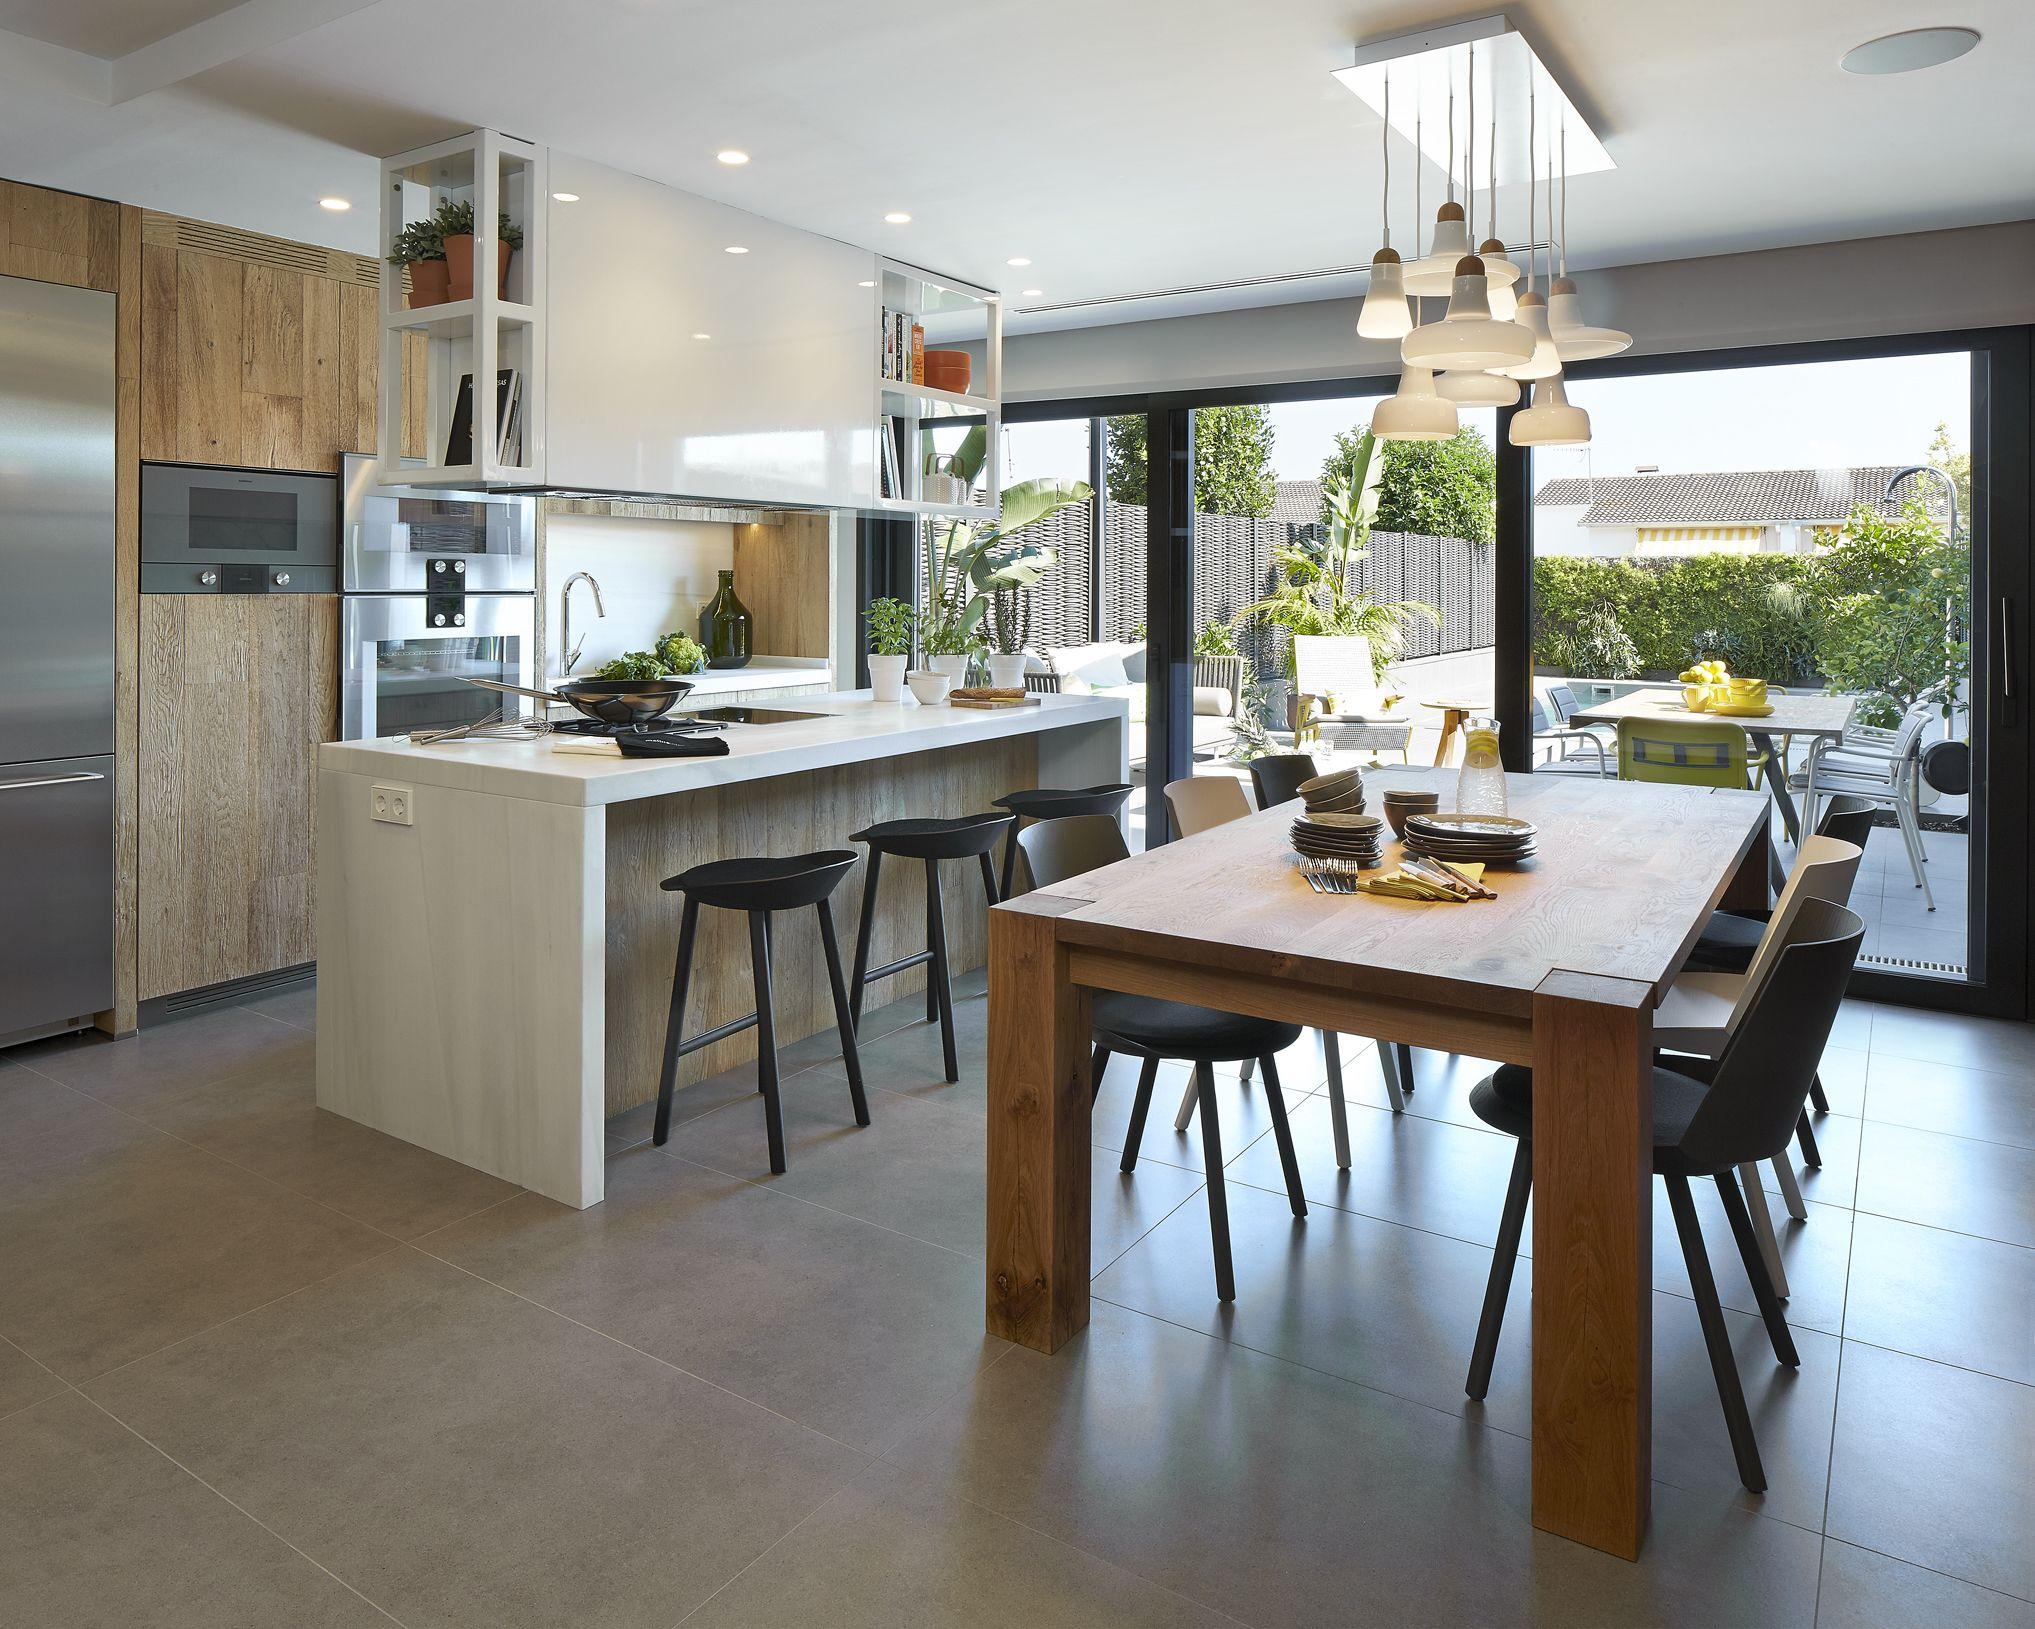 Molins interiors arquitectura interior interiorismo for Comedor funcional